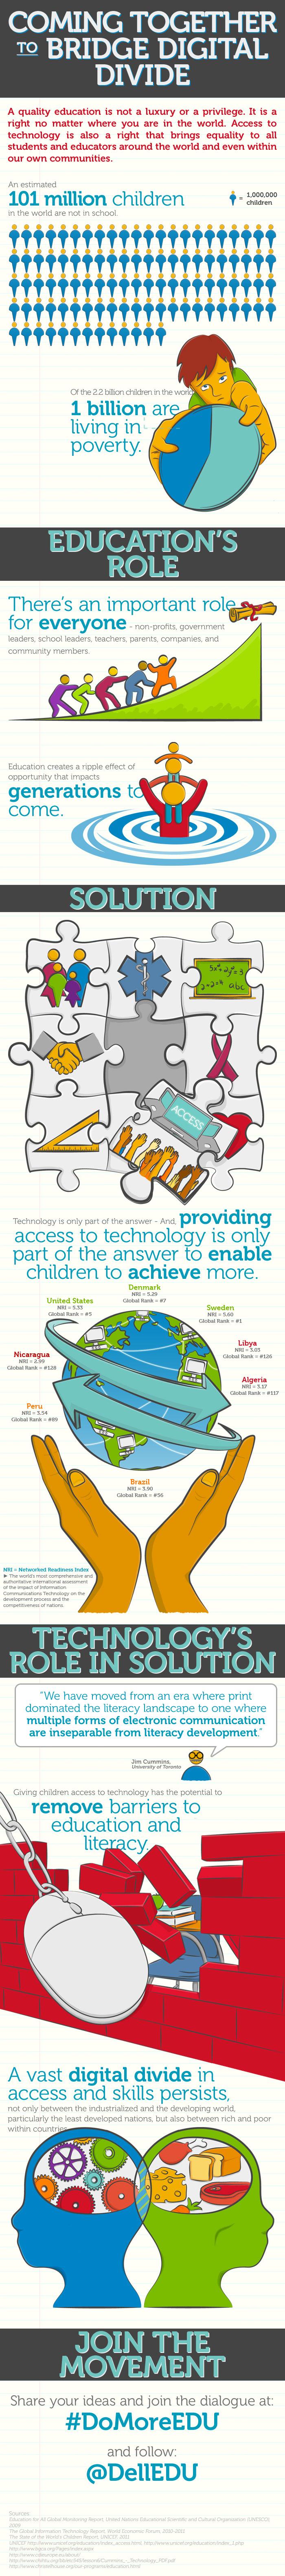 Bridge the Digital Gap-Infographic